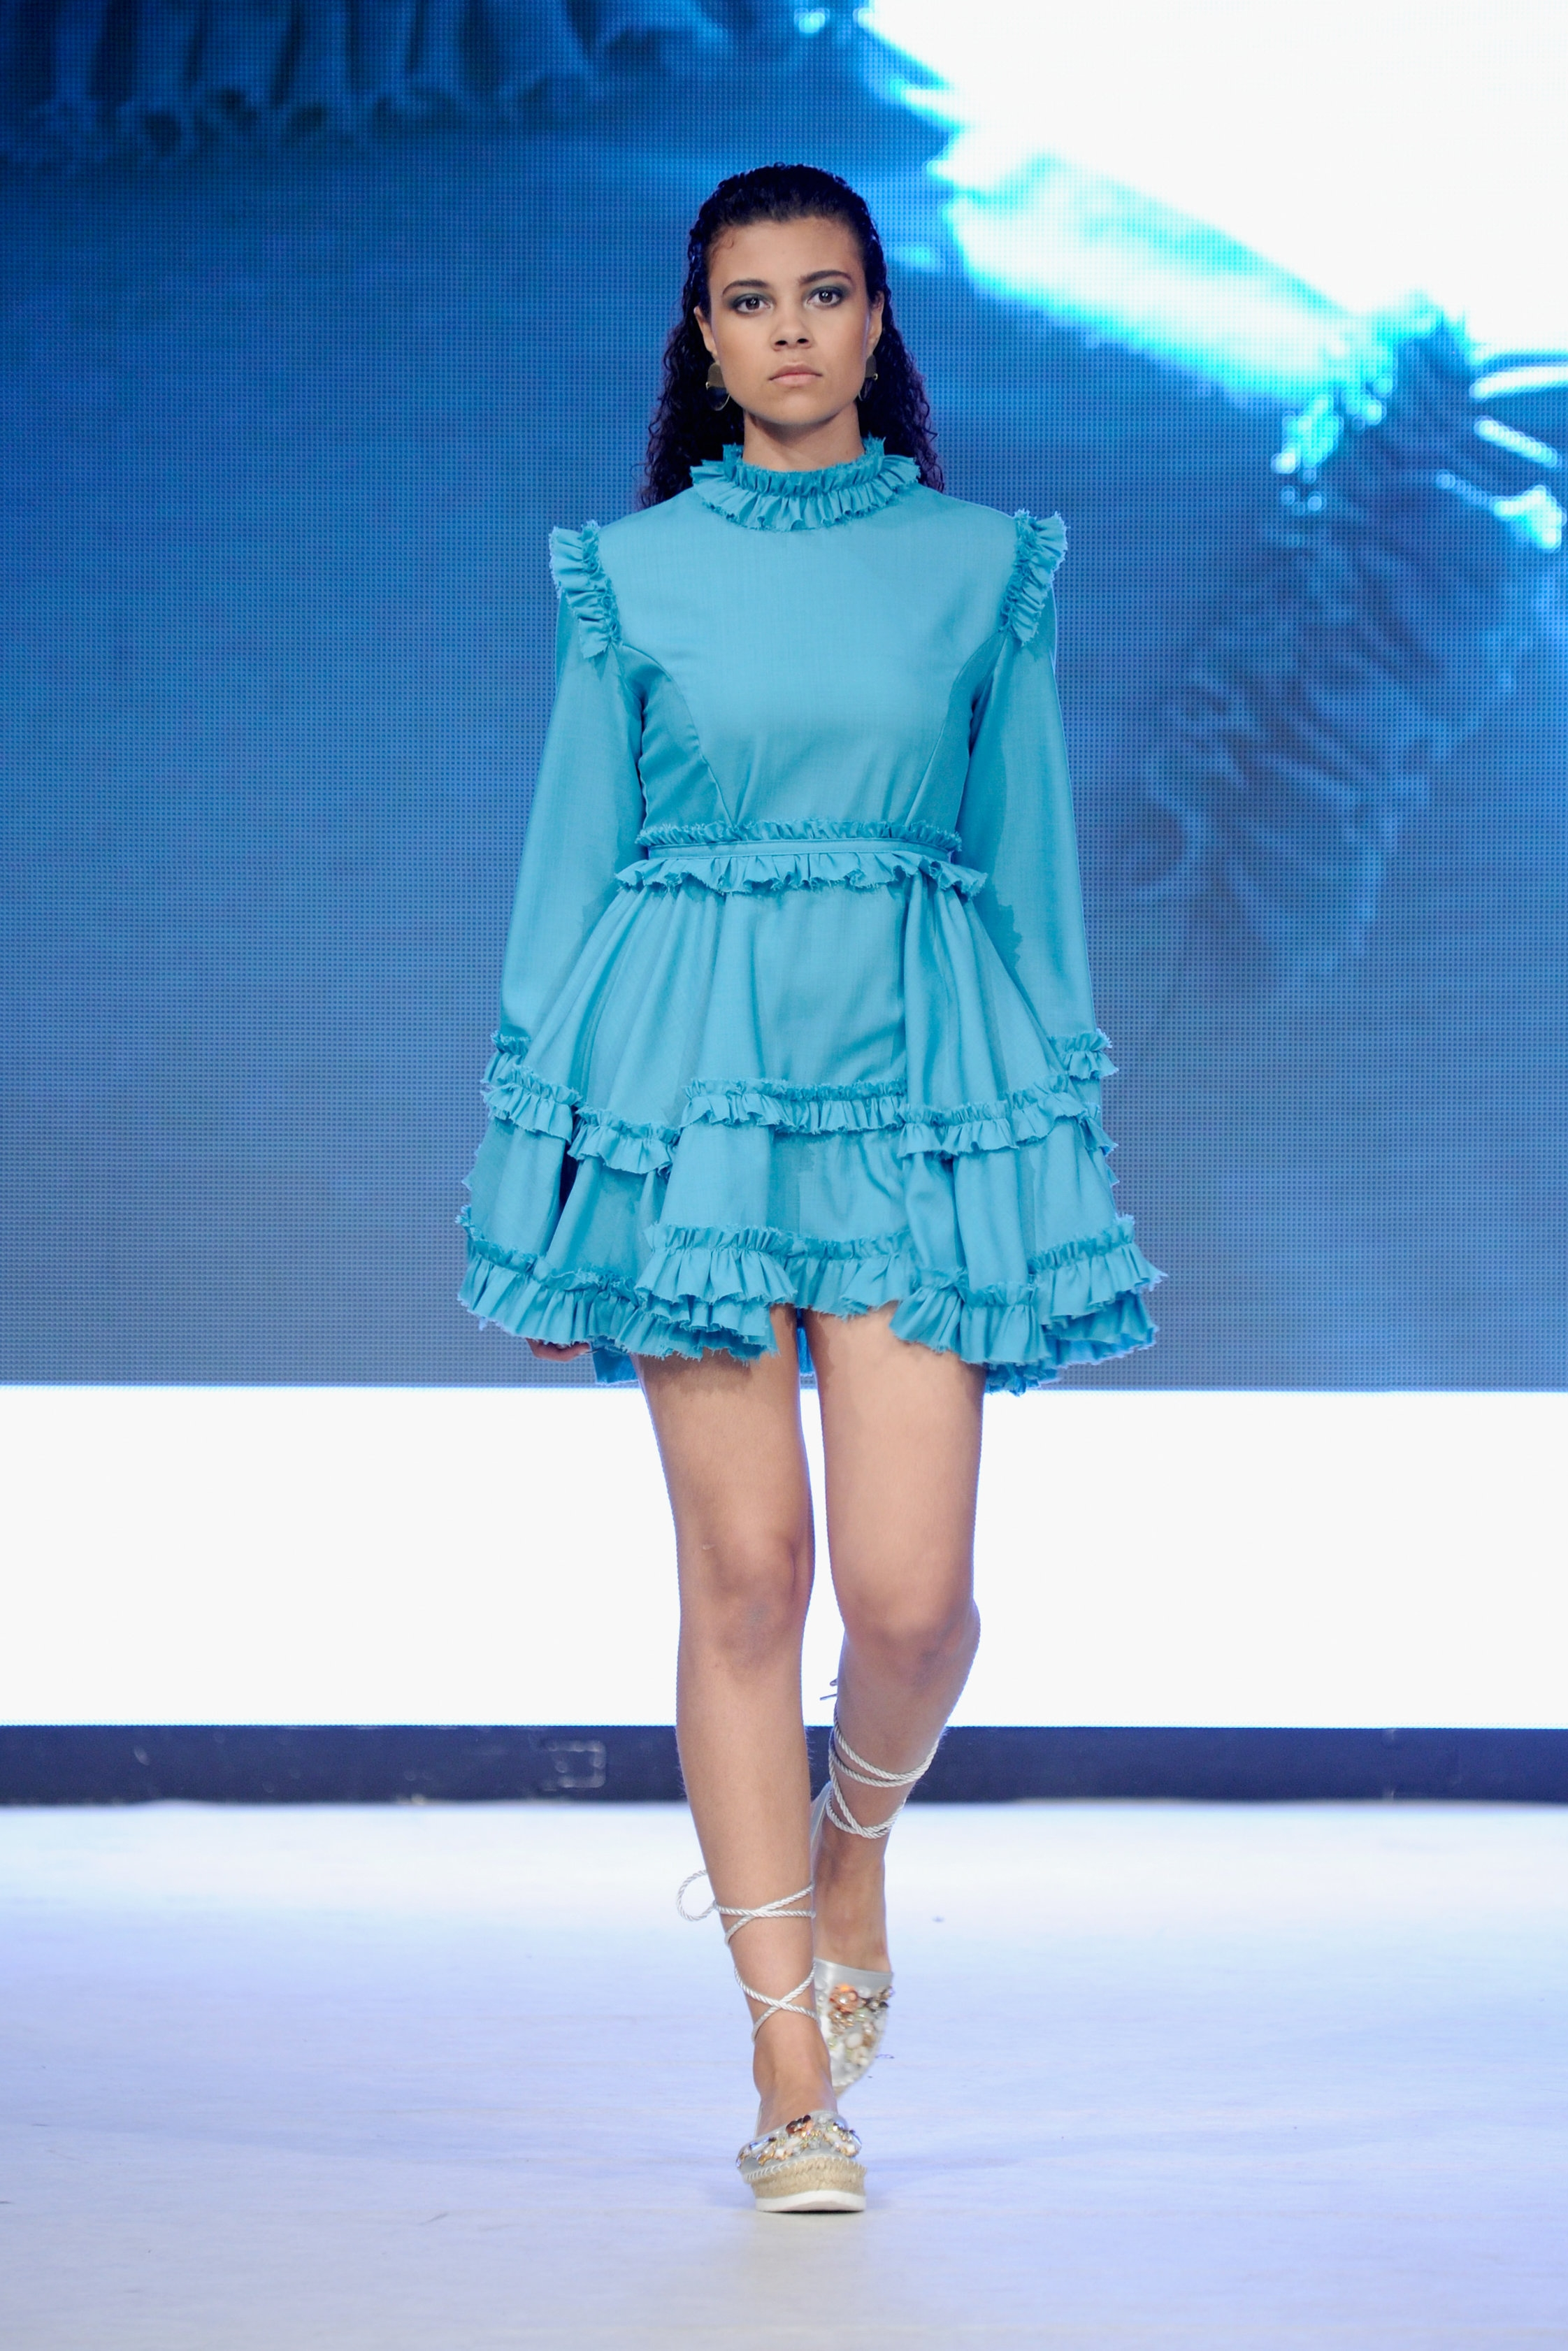 look 4 - 100% merino wool dress